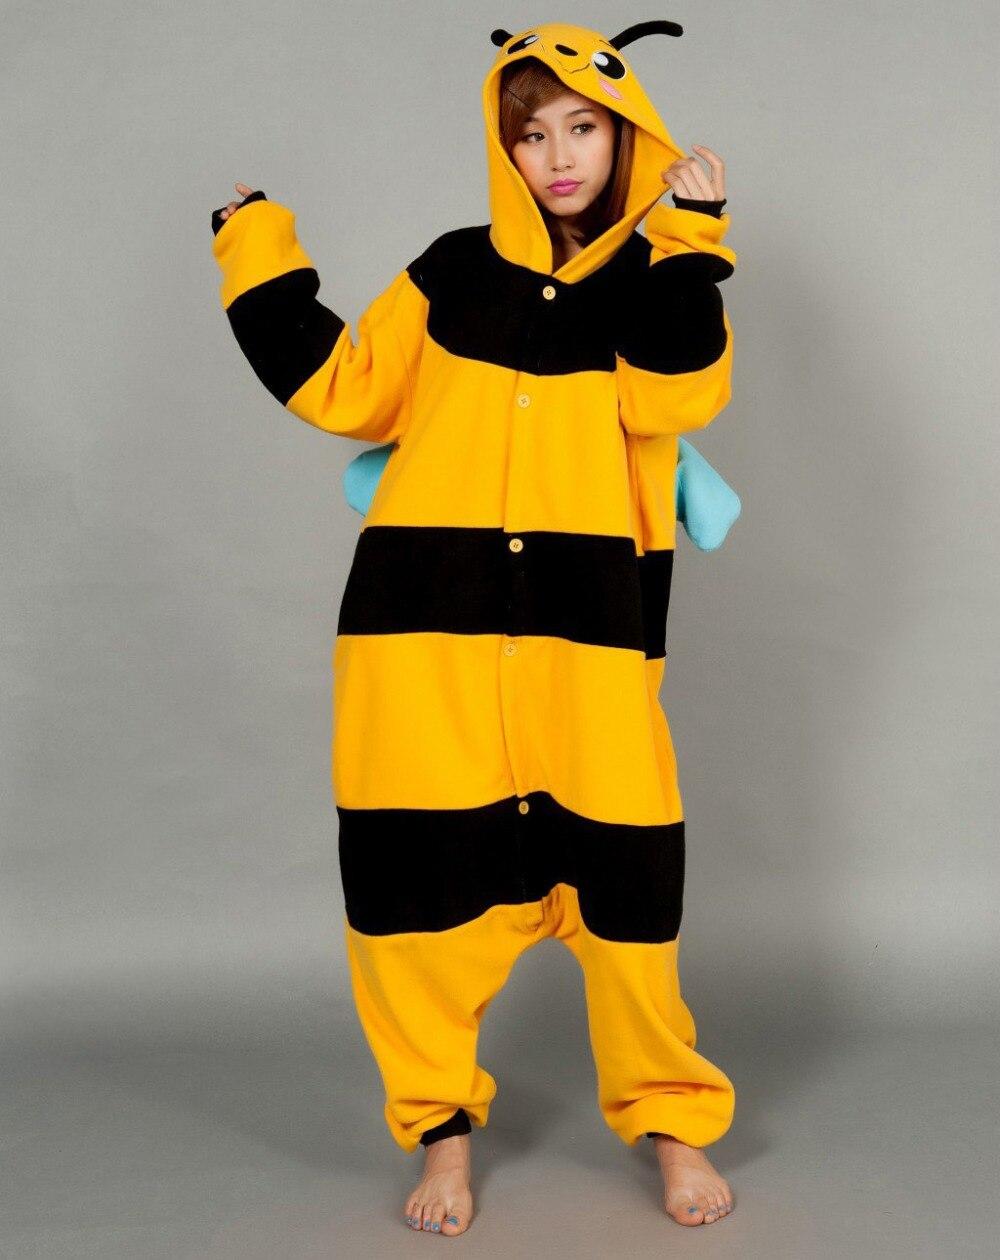 Fashion Anime Pyjama Onesie Animal Hooded Long Sleeve Cosplay Costomes for Adult Unisex Homewear Bee Sleepwear